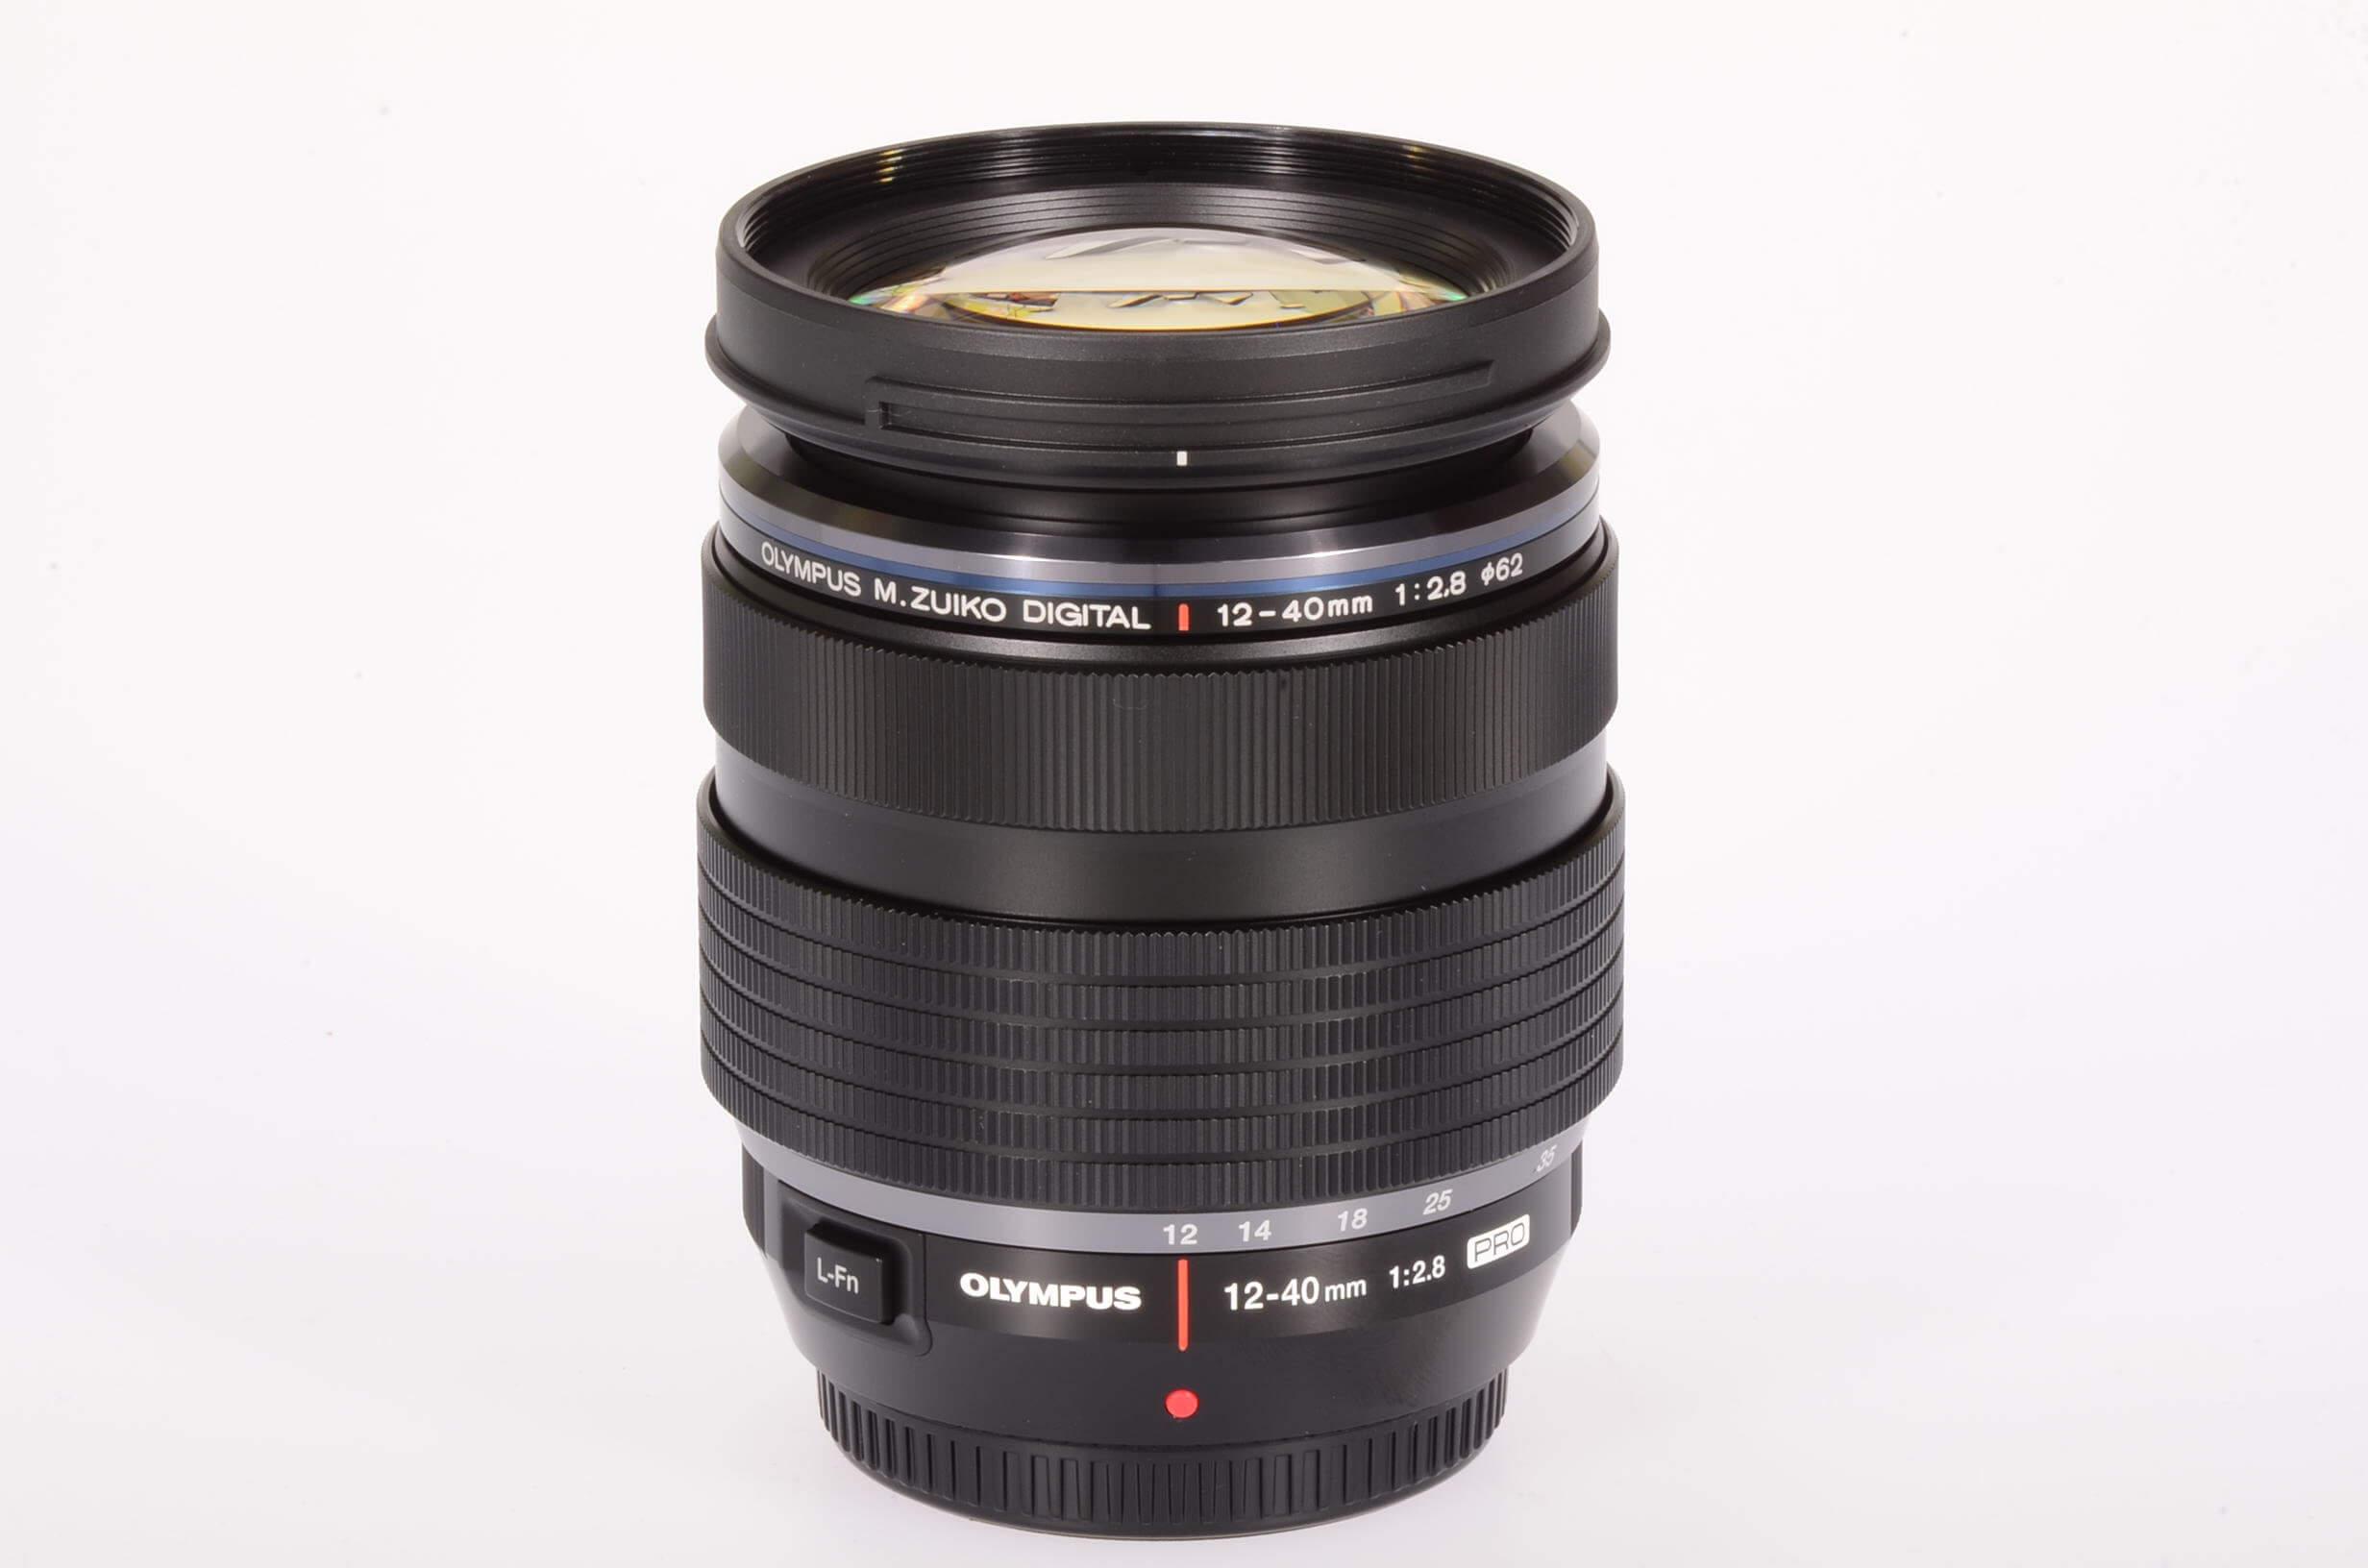 Olympus 12-40mm f2.8 Pro M. Zuiko Digital, Unused! UK supplied